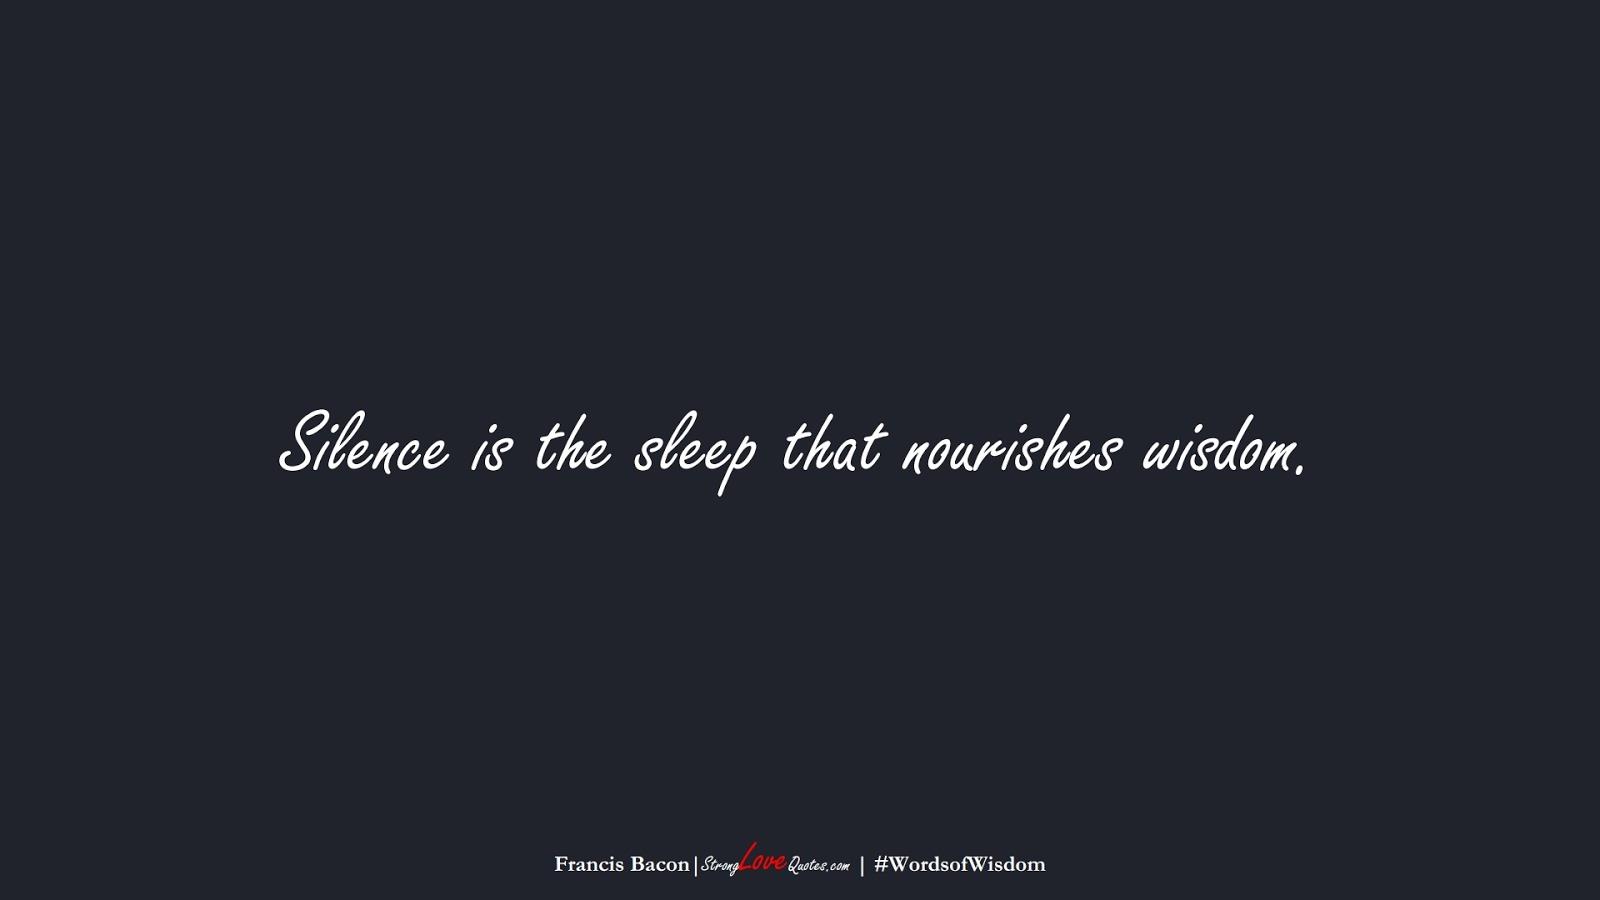 Silence is the sleep that nourishes wisdom. (Francis Bacon);  #WordsofWisdom